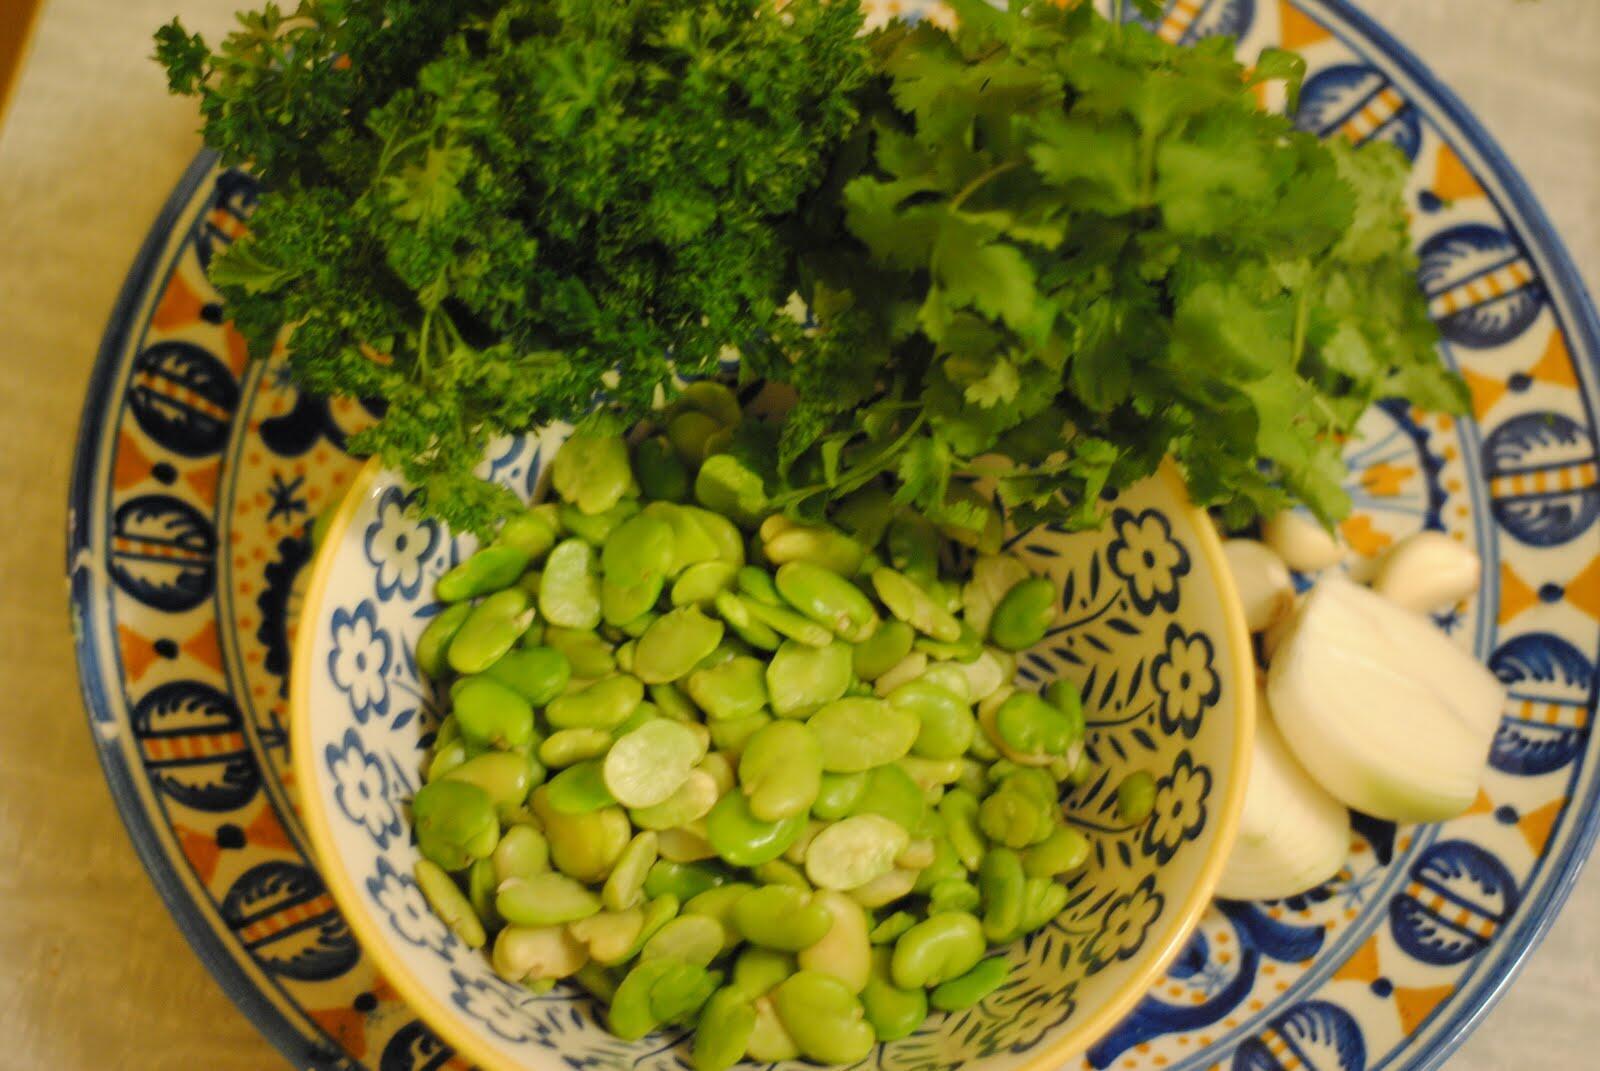 Fava beans accompanied by garlic and herbs